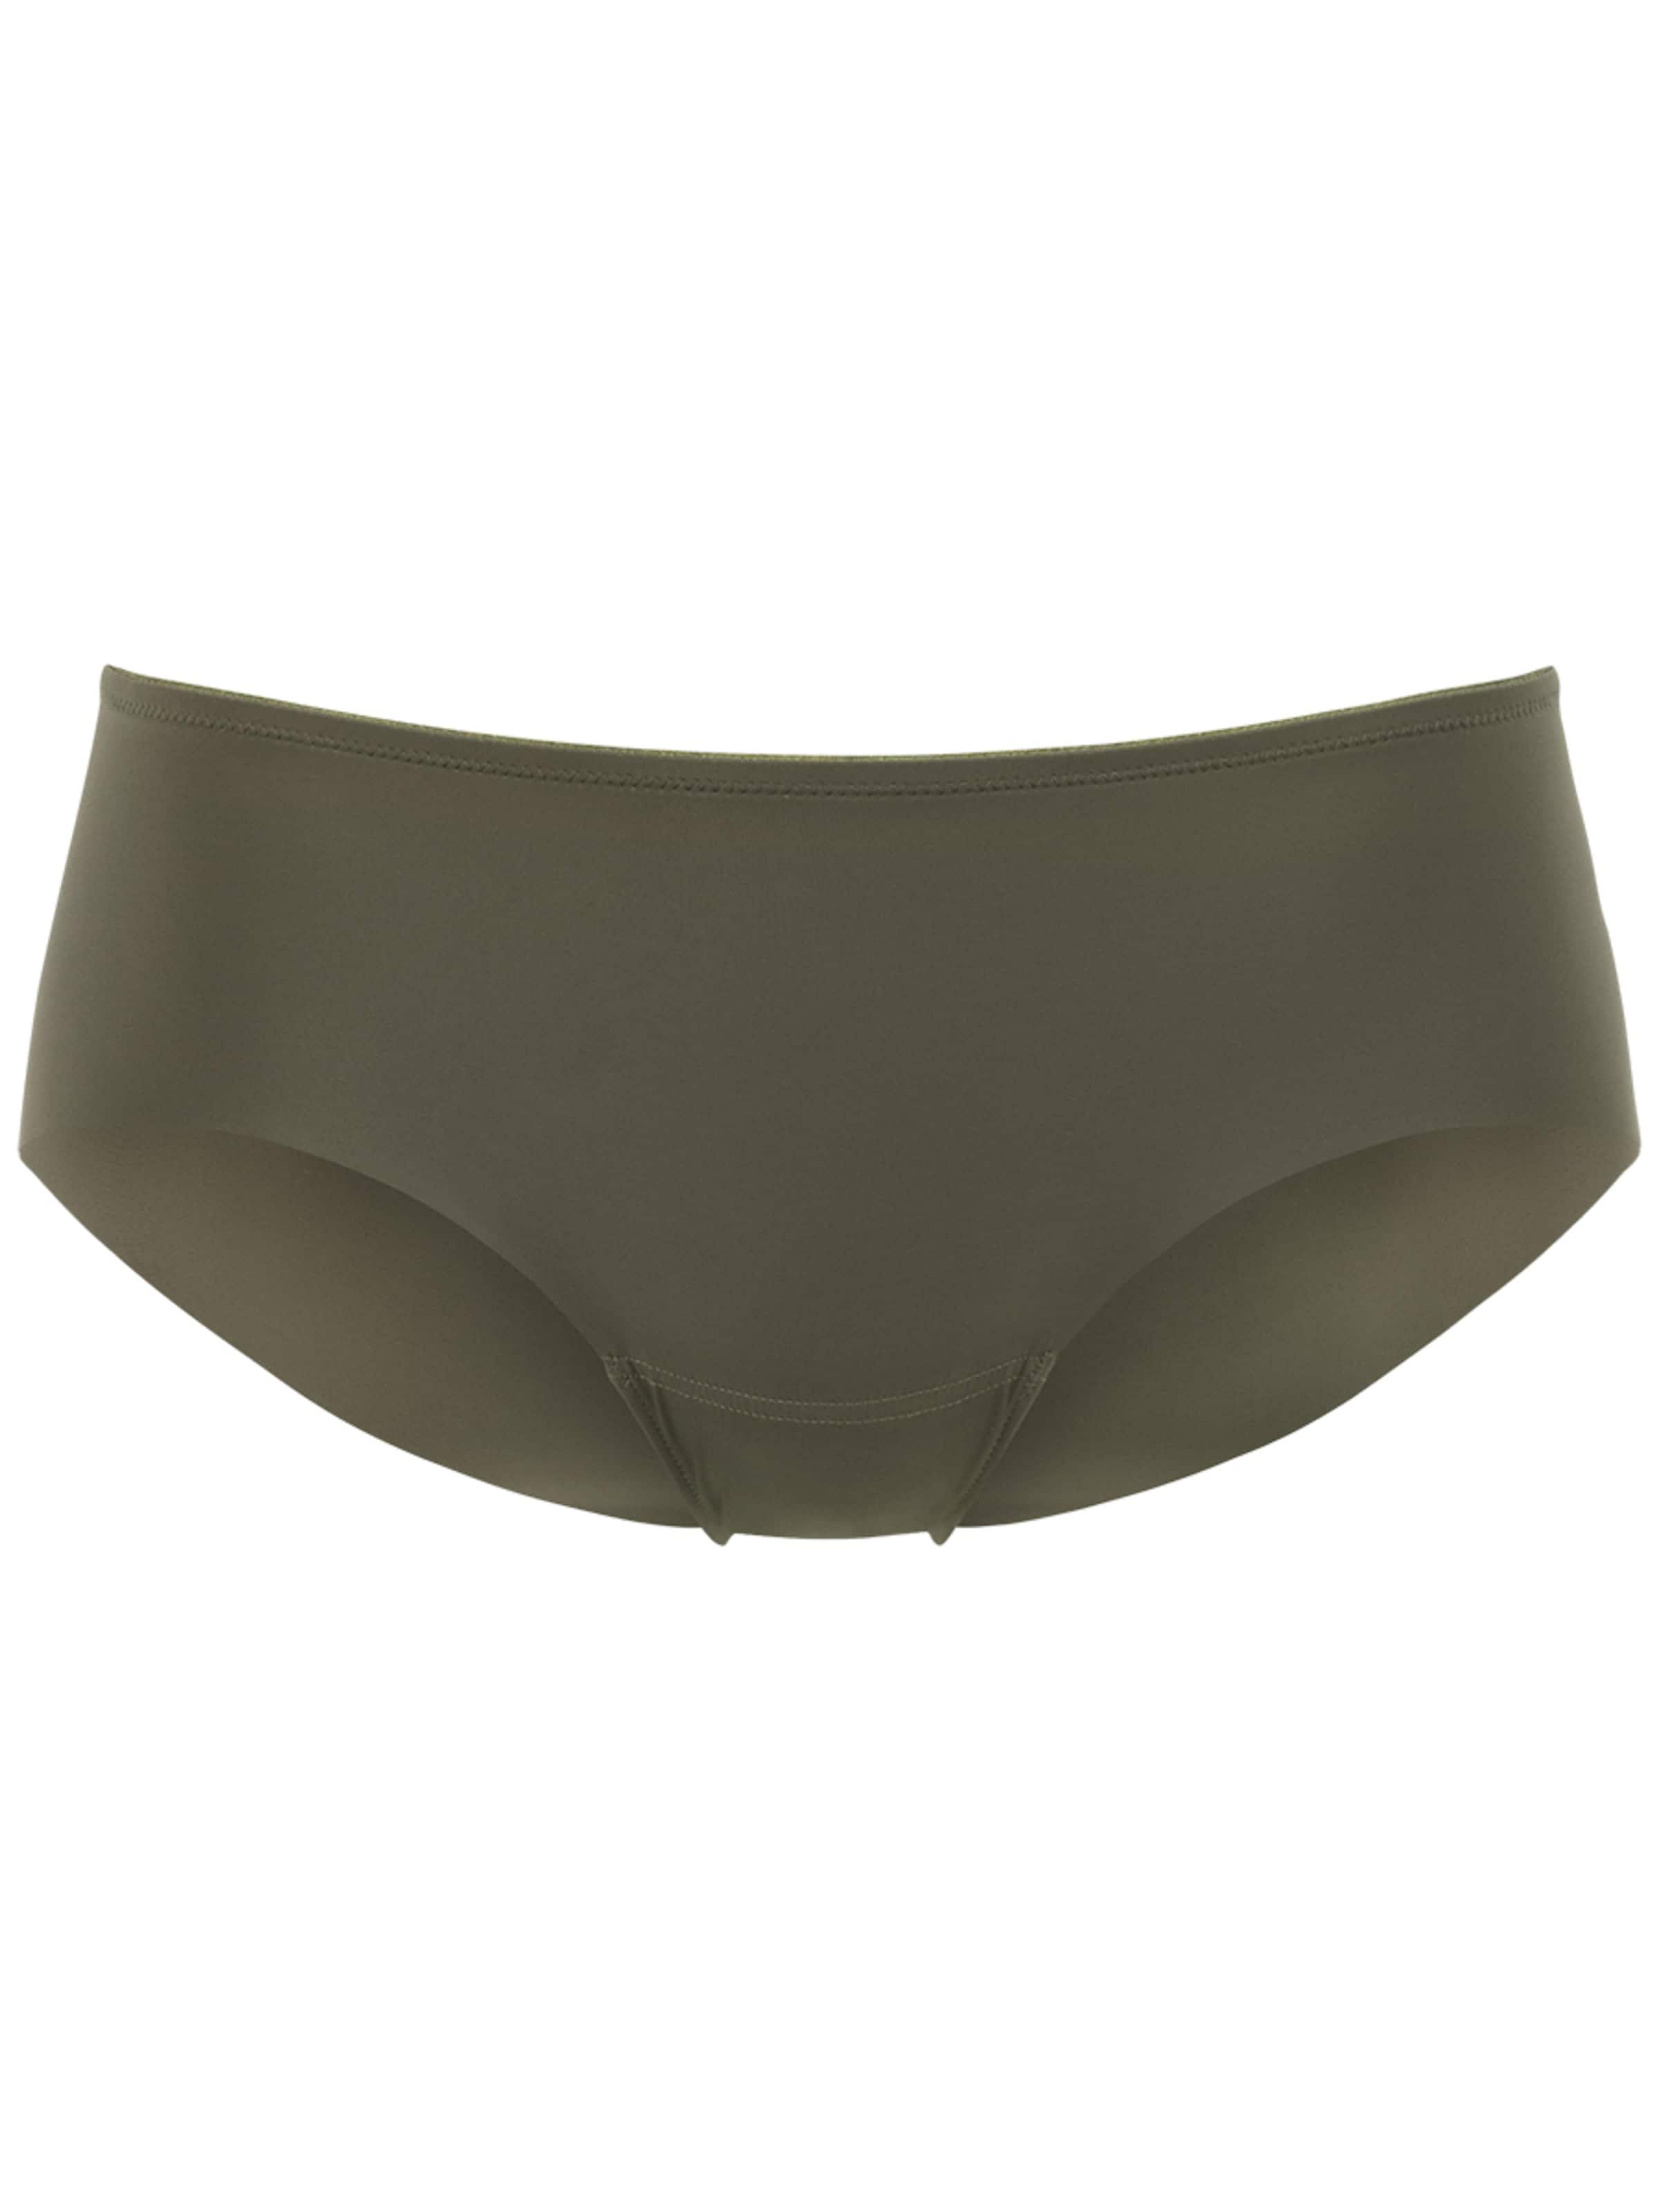 Regular' En Kaki Palmers 'contour Culotte Panty fbvIYgym76